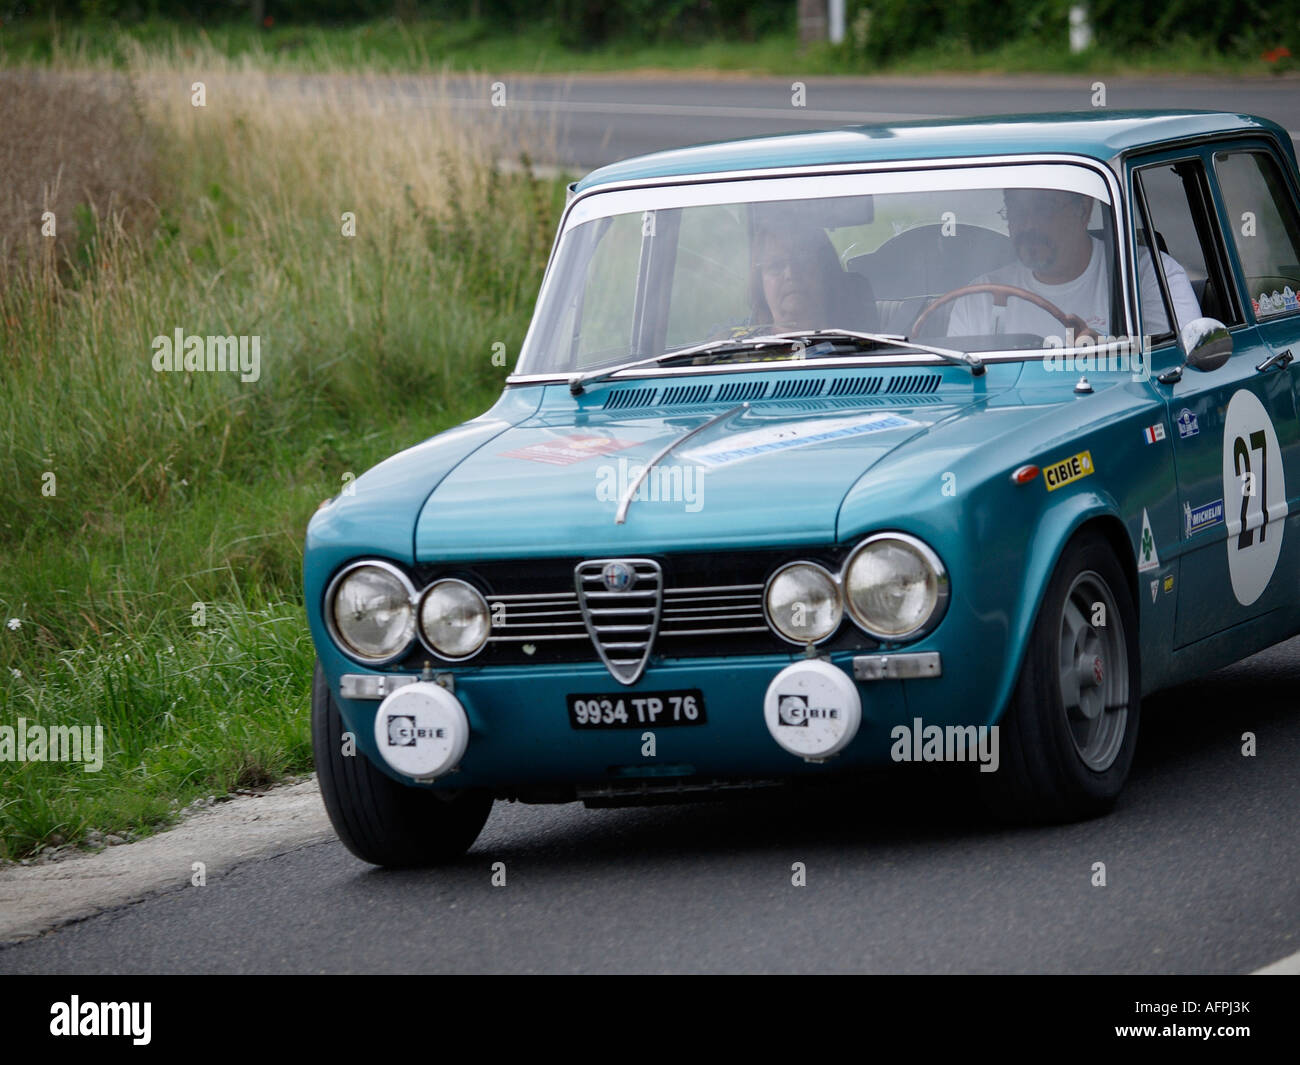 Metallic blue Alfa Romeo Giulia competing in the Boucles de Loire classic car rallye 2007 Cande sur Beuvron France - Stock Image